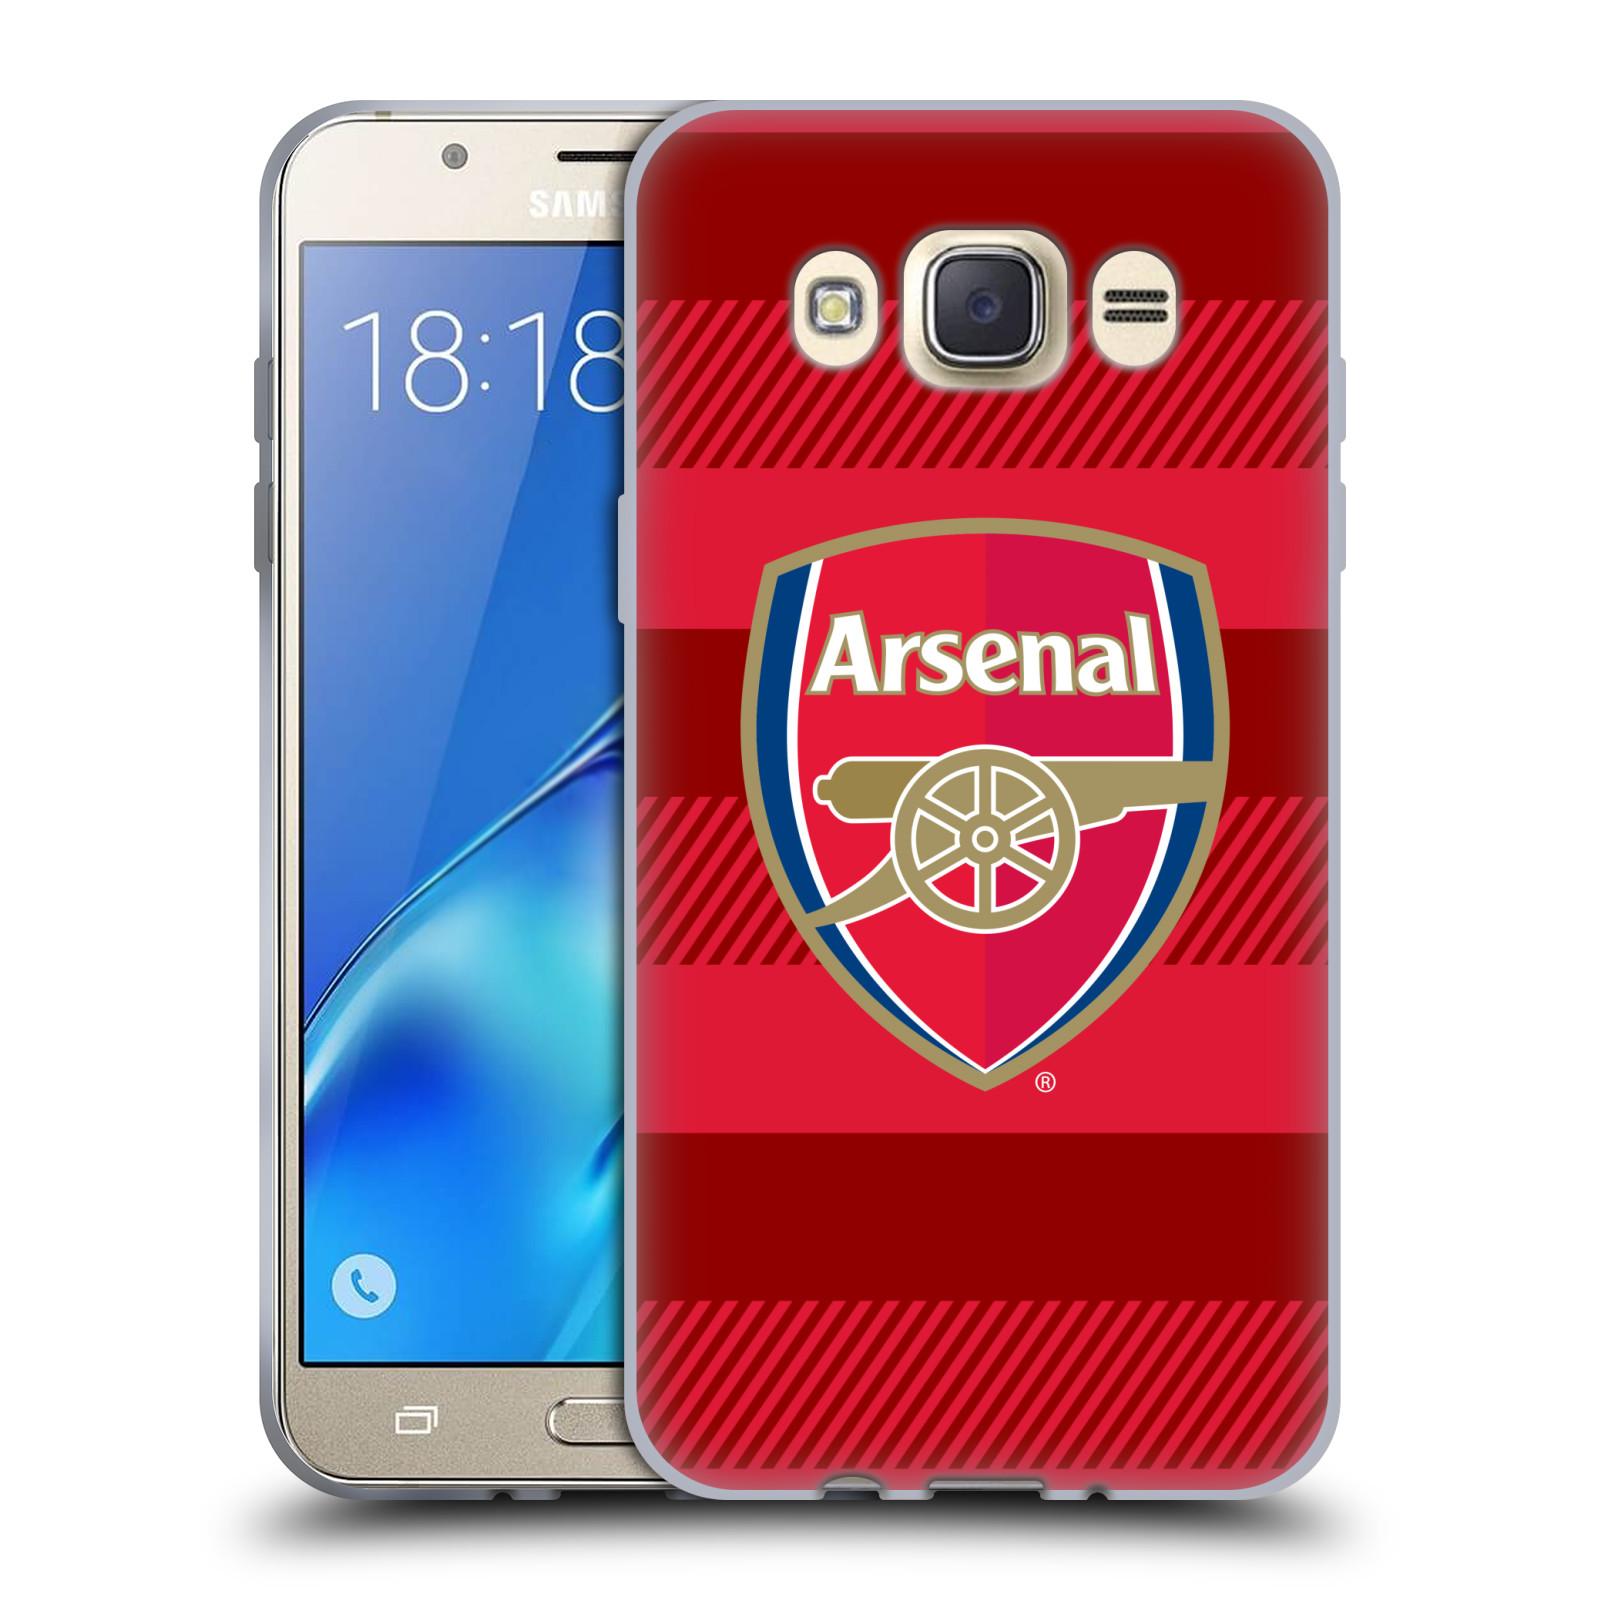 Silikonové pouzdro na mobil Samsung Galaxy J7 (2016) - Head Case - Arsenal FC - Logo s pruhy